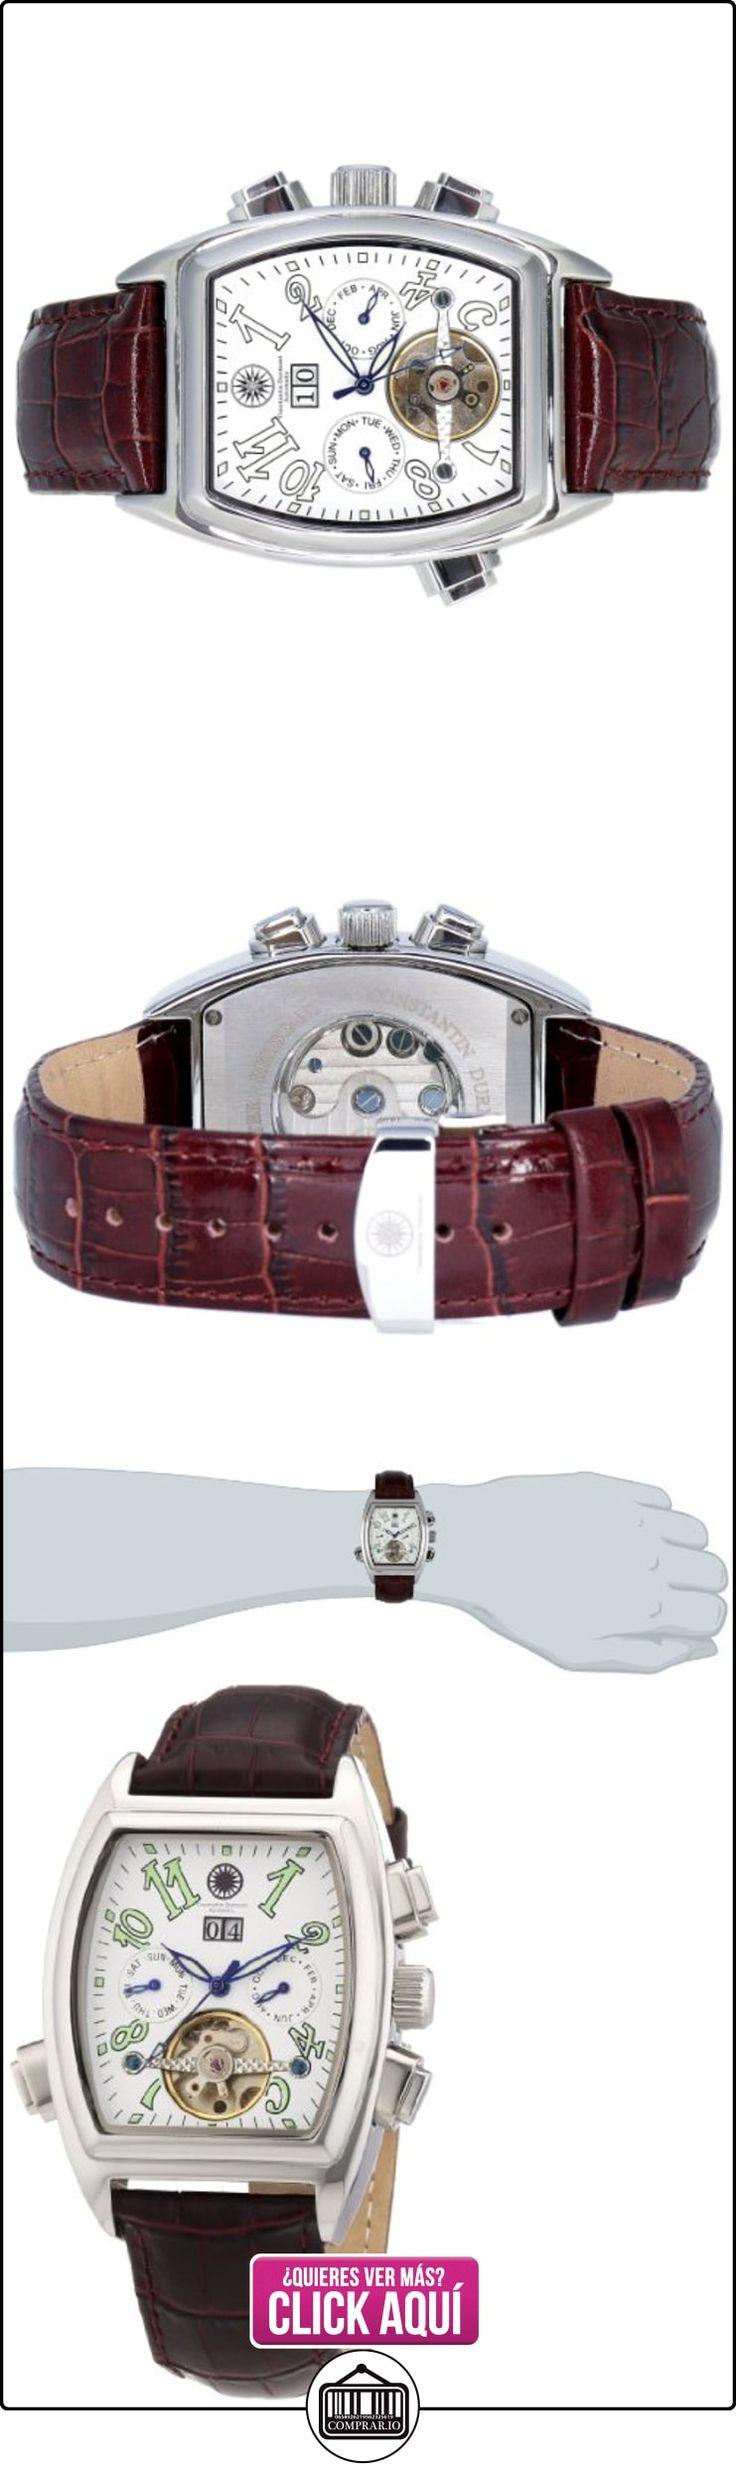 Constantin Durmont Tonneau - Reloj analógico de caballero automático con correa de piel marrón - sumergible a 30 metros  ✿ Relojes para hombre - (Gama media/alta) ✿ ▬► Ver oferta: http://comprar.io/goto/B005DKKCM8